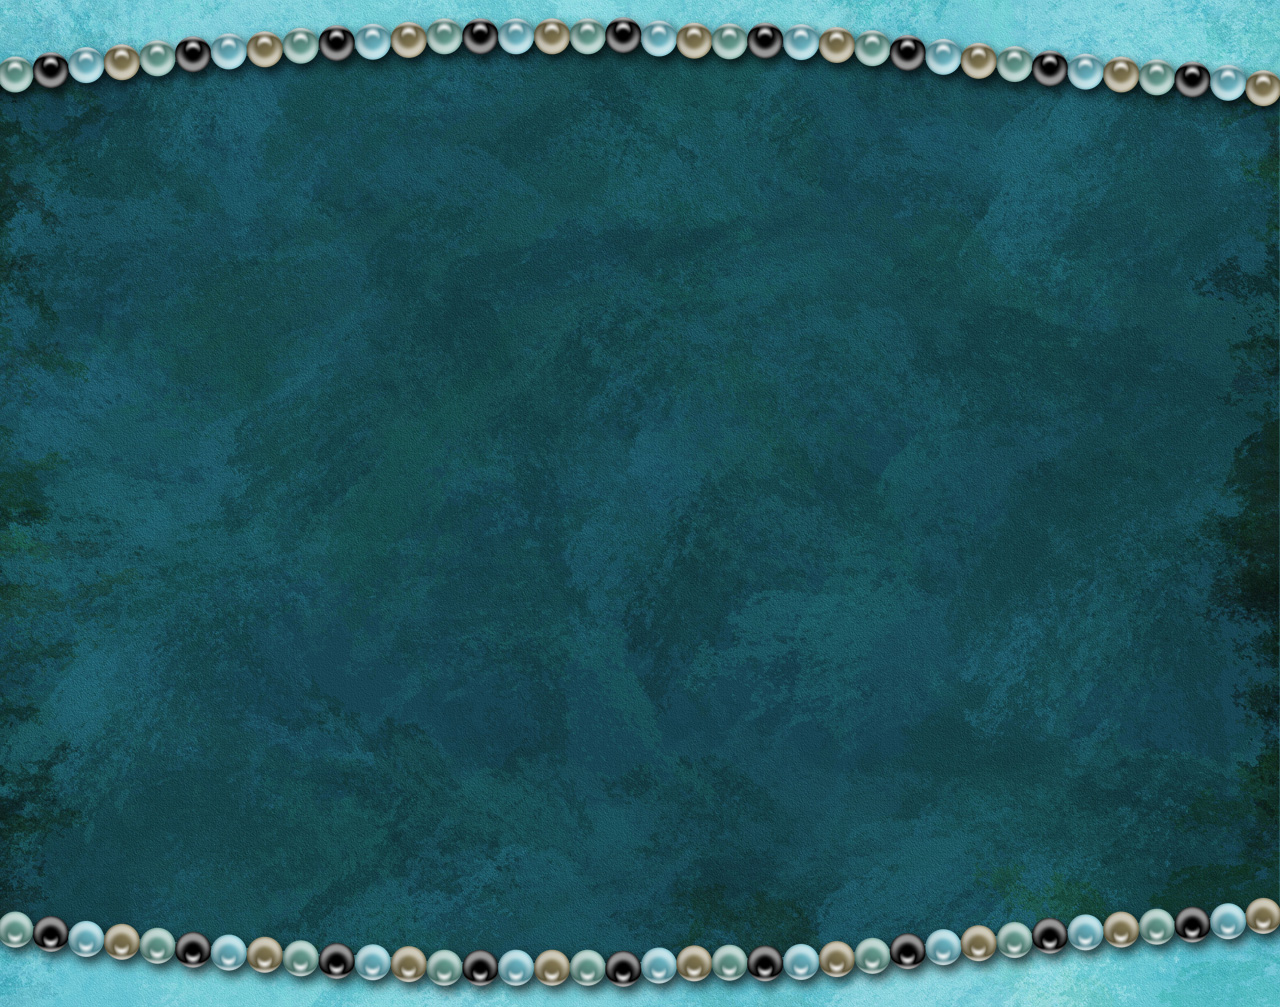 Nautical Design | Summer Design | The Cutest Blog on the Block |Masculine Blue Background